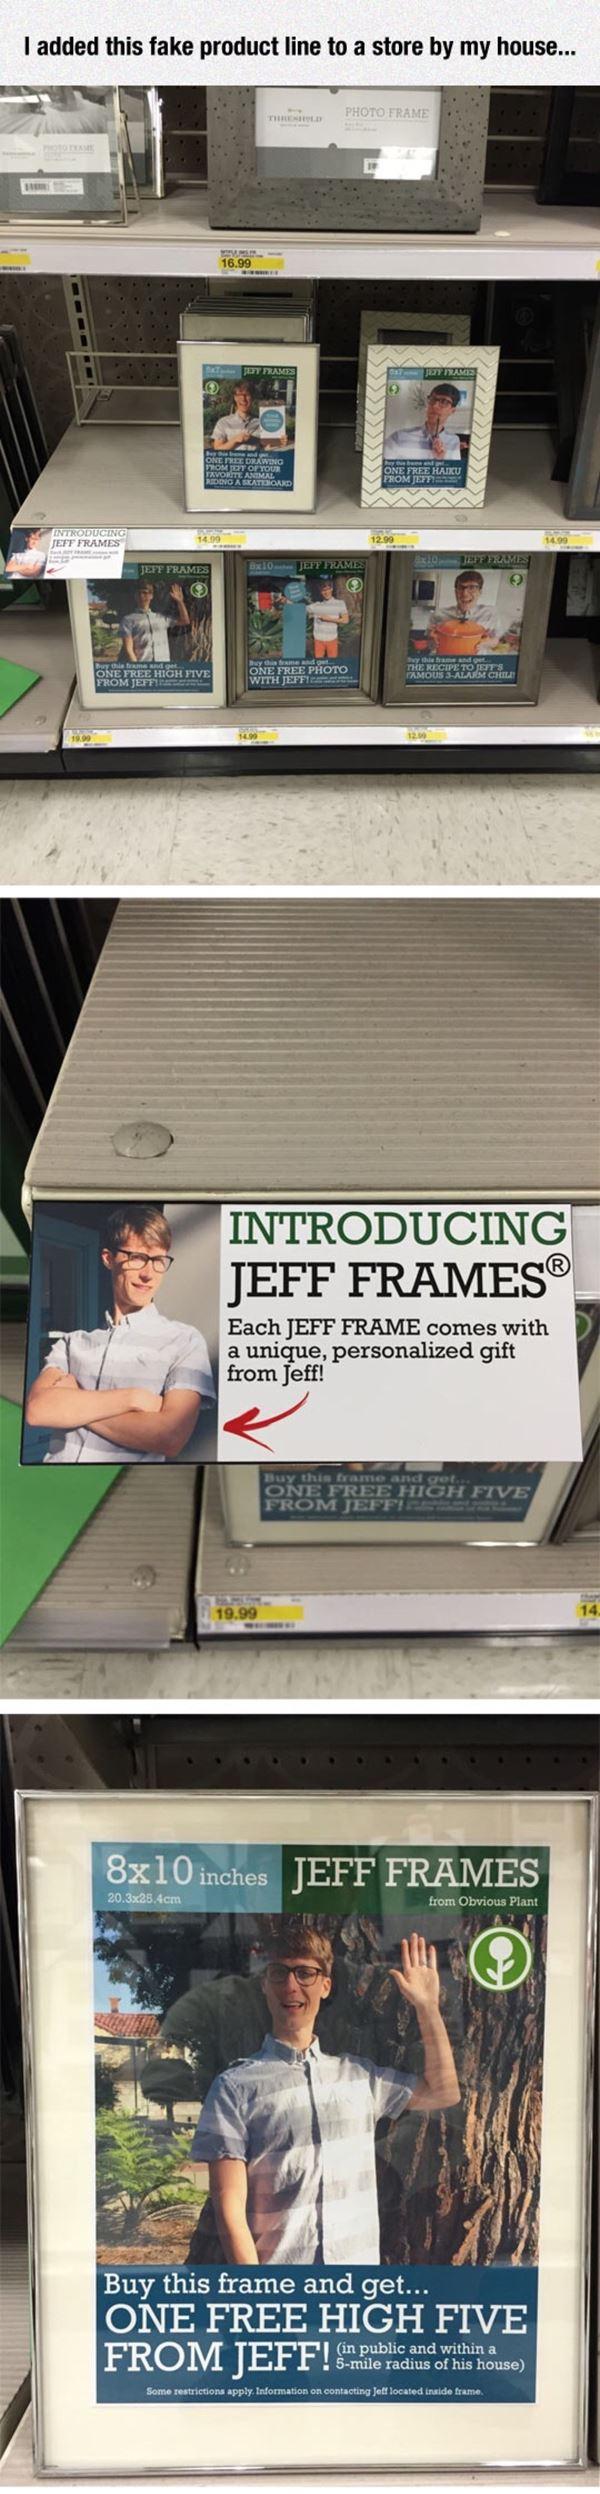 Jeff frames